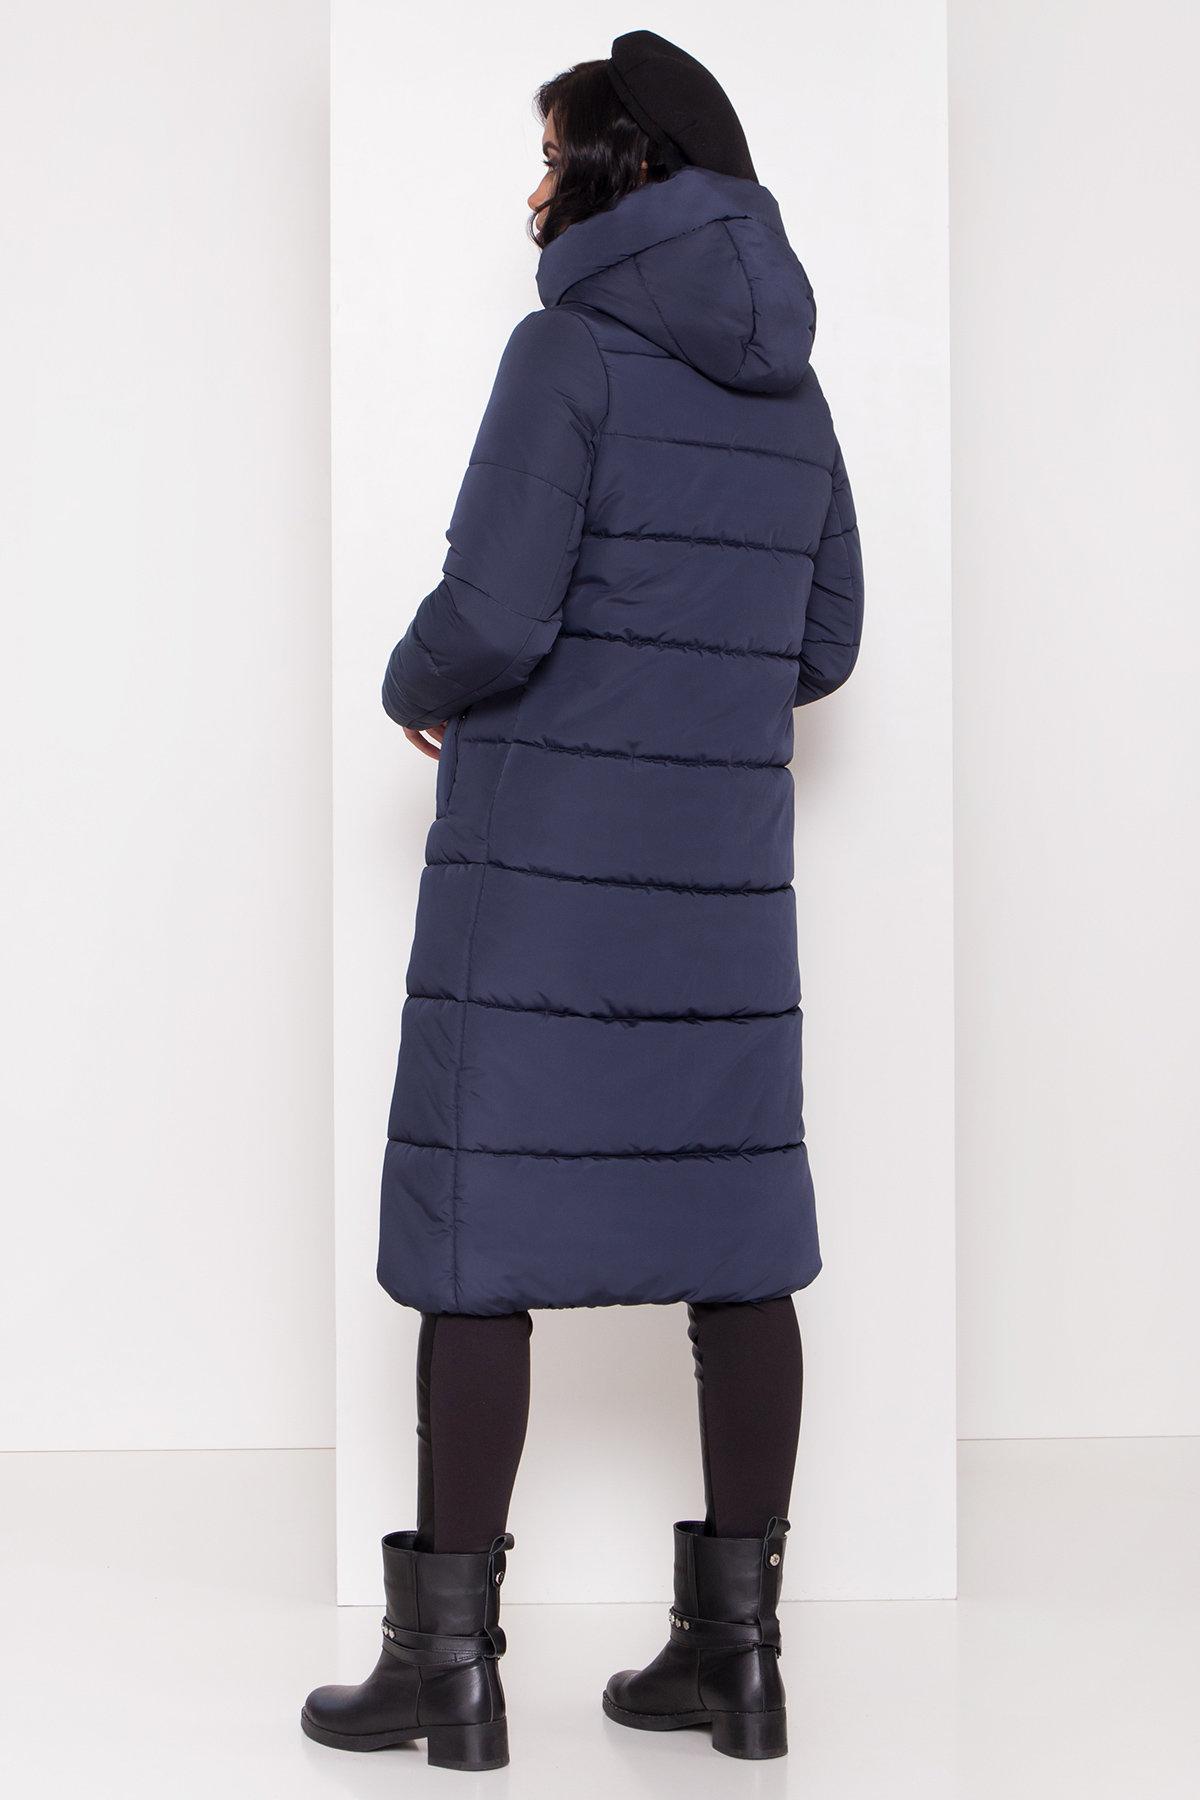 Длинный пуховик зимний Сигма Канада 8230 Цвет: т. синий